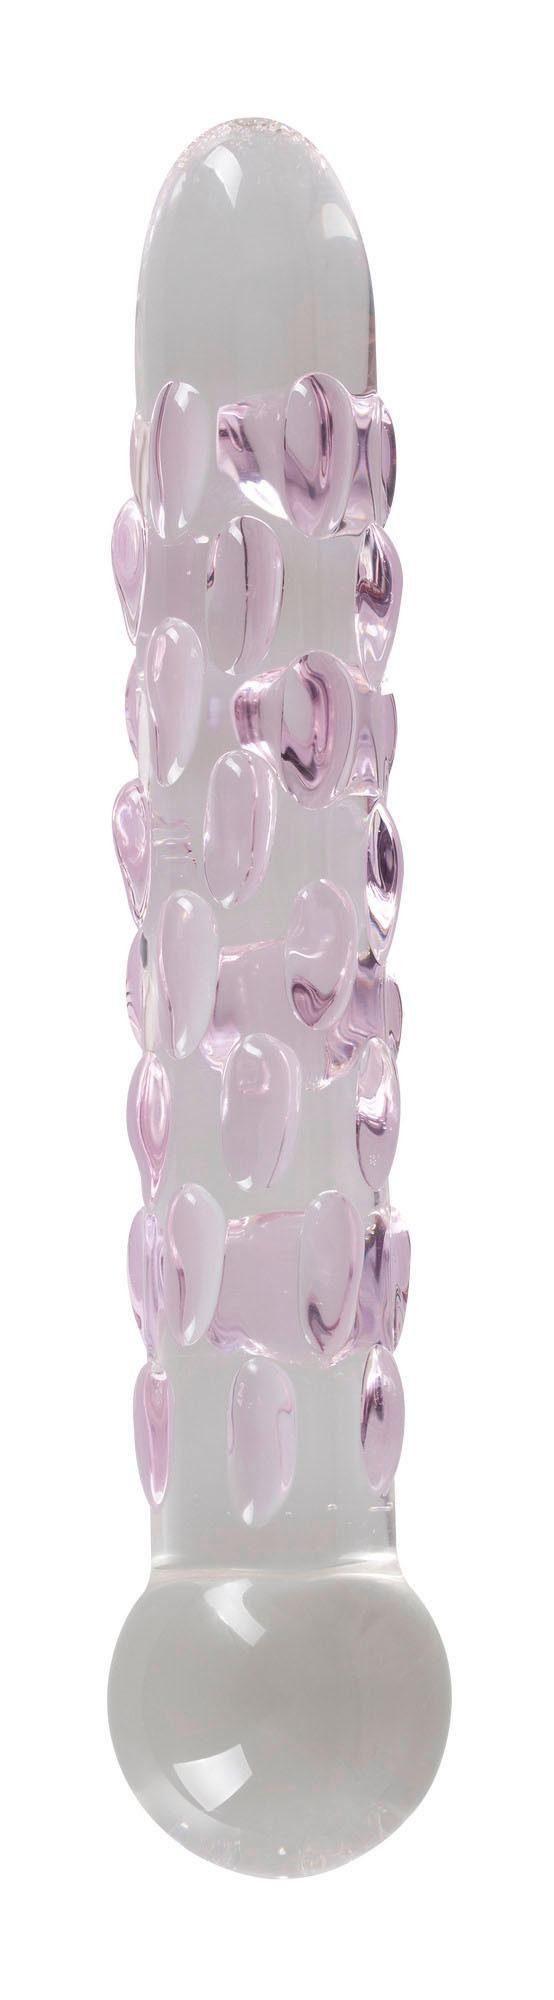 Icicles Glasdildo Icicles No. 7, Glas-Dildo mit Reiznoppen und Standfuß